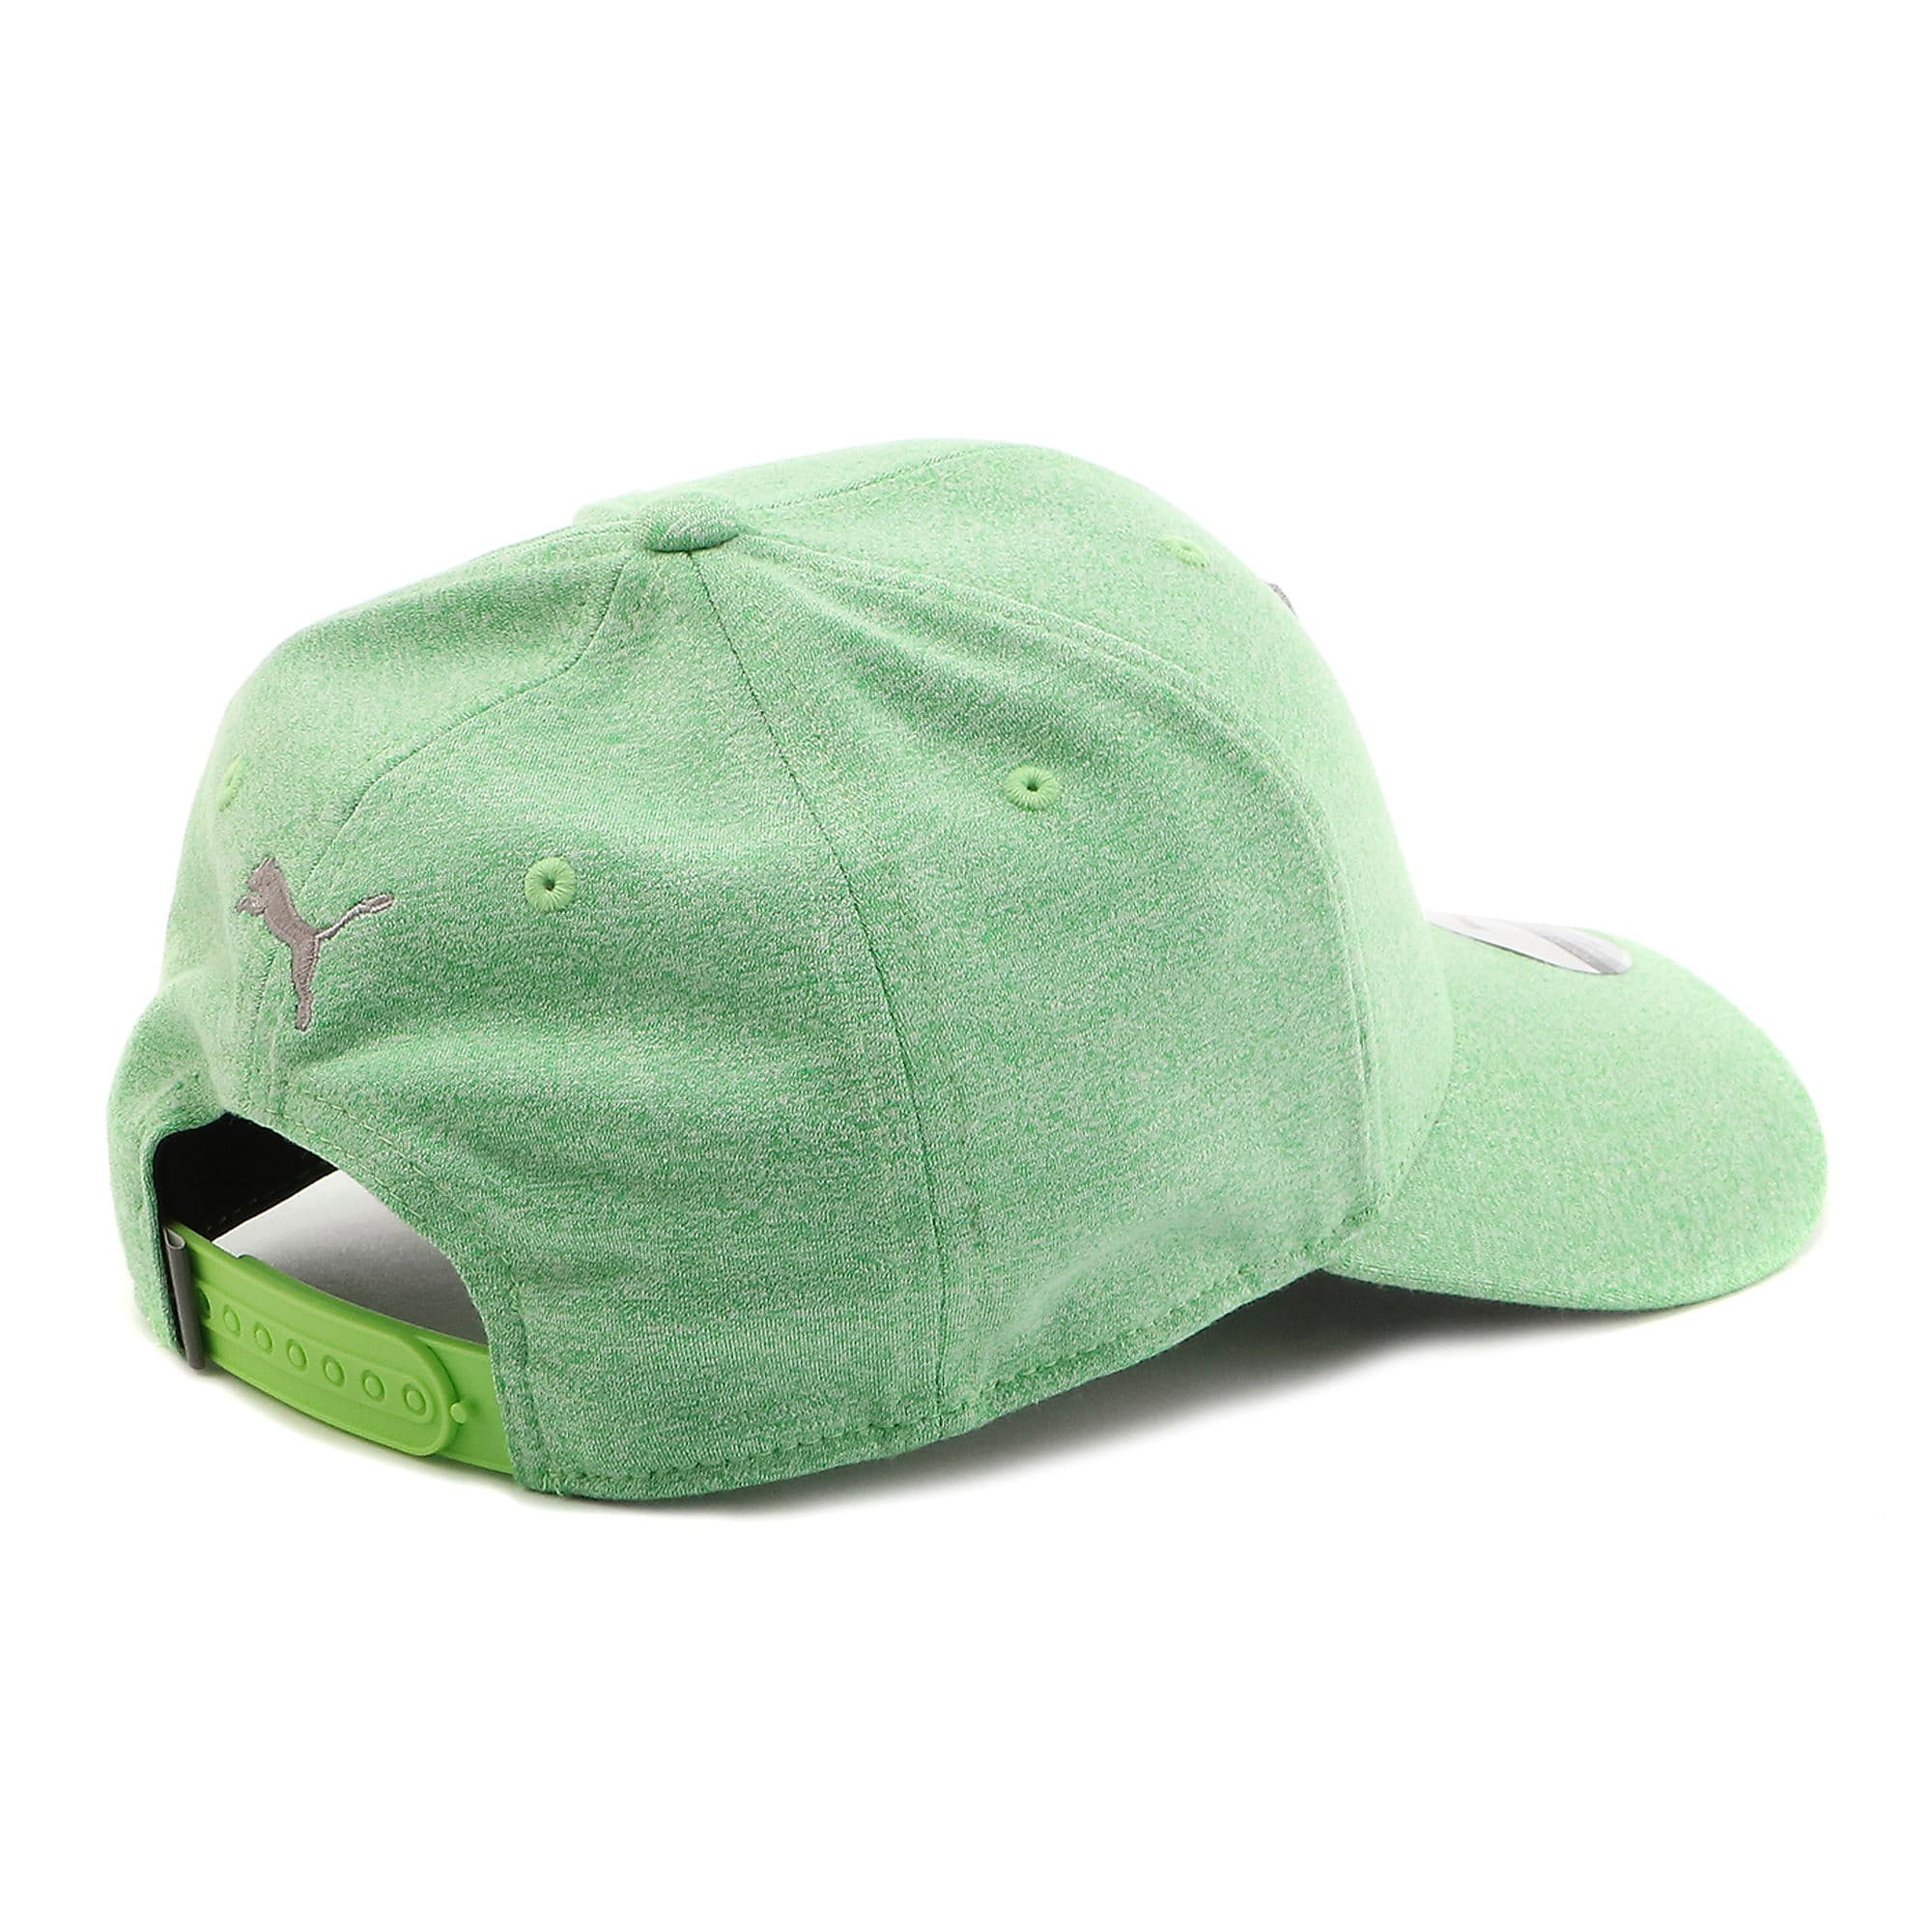 Thumbnail 2 of ゴルフ Pマークスナップバックキャップ, Irish Green, medium-JPN